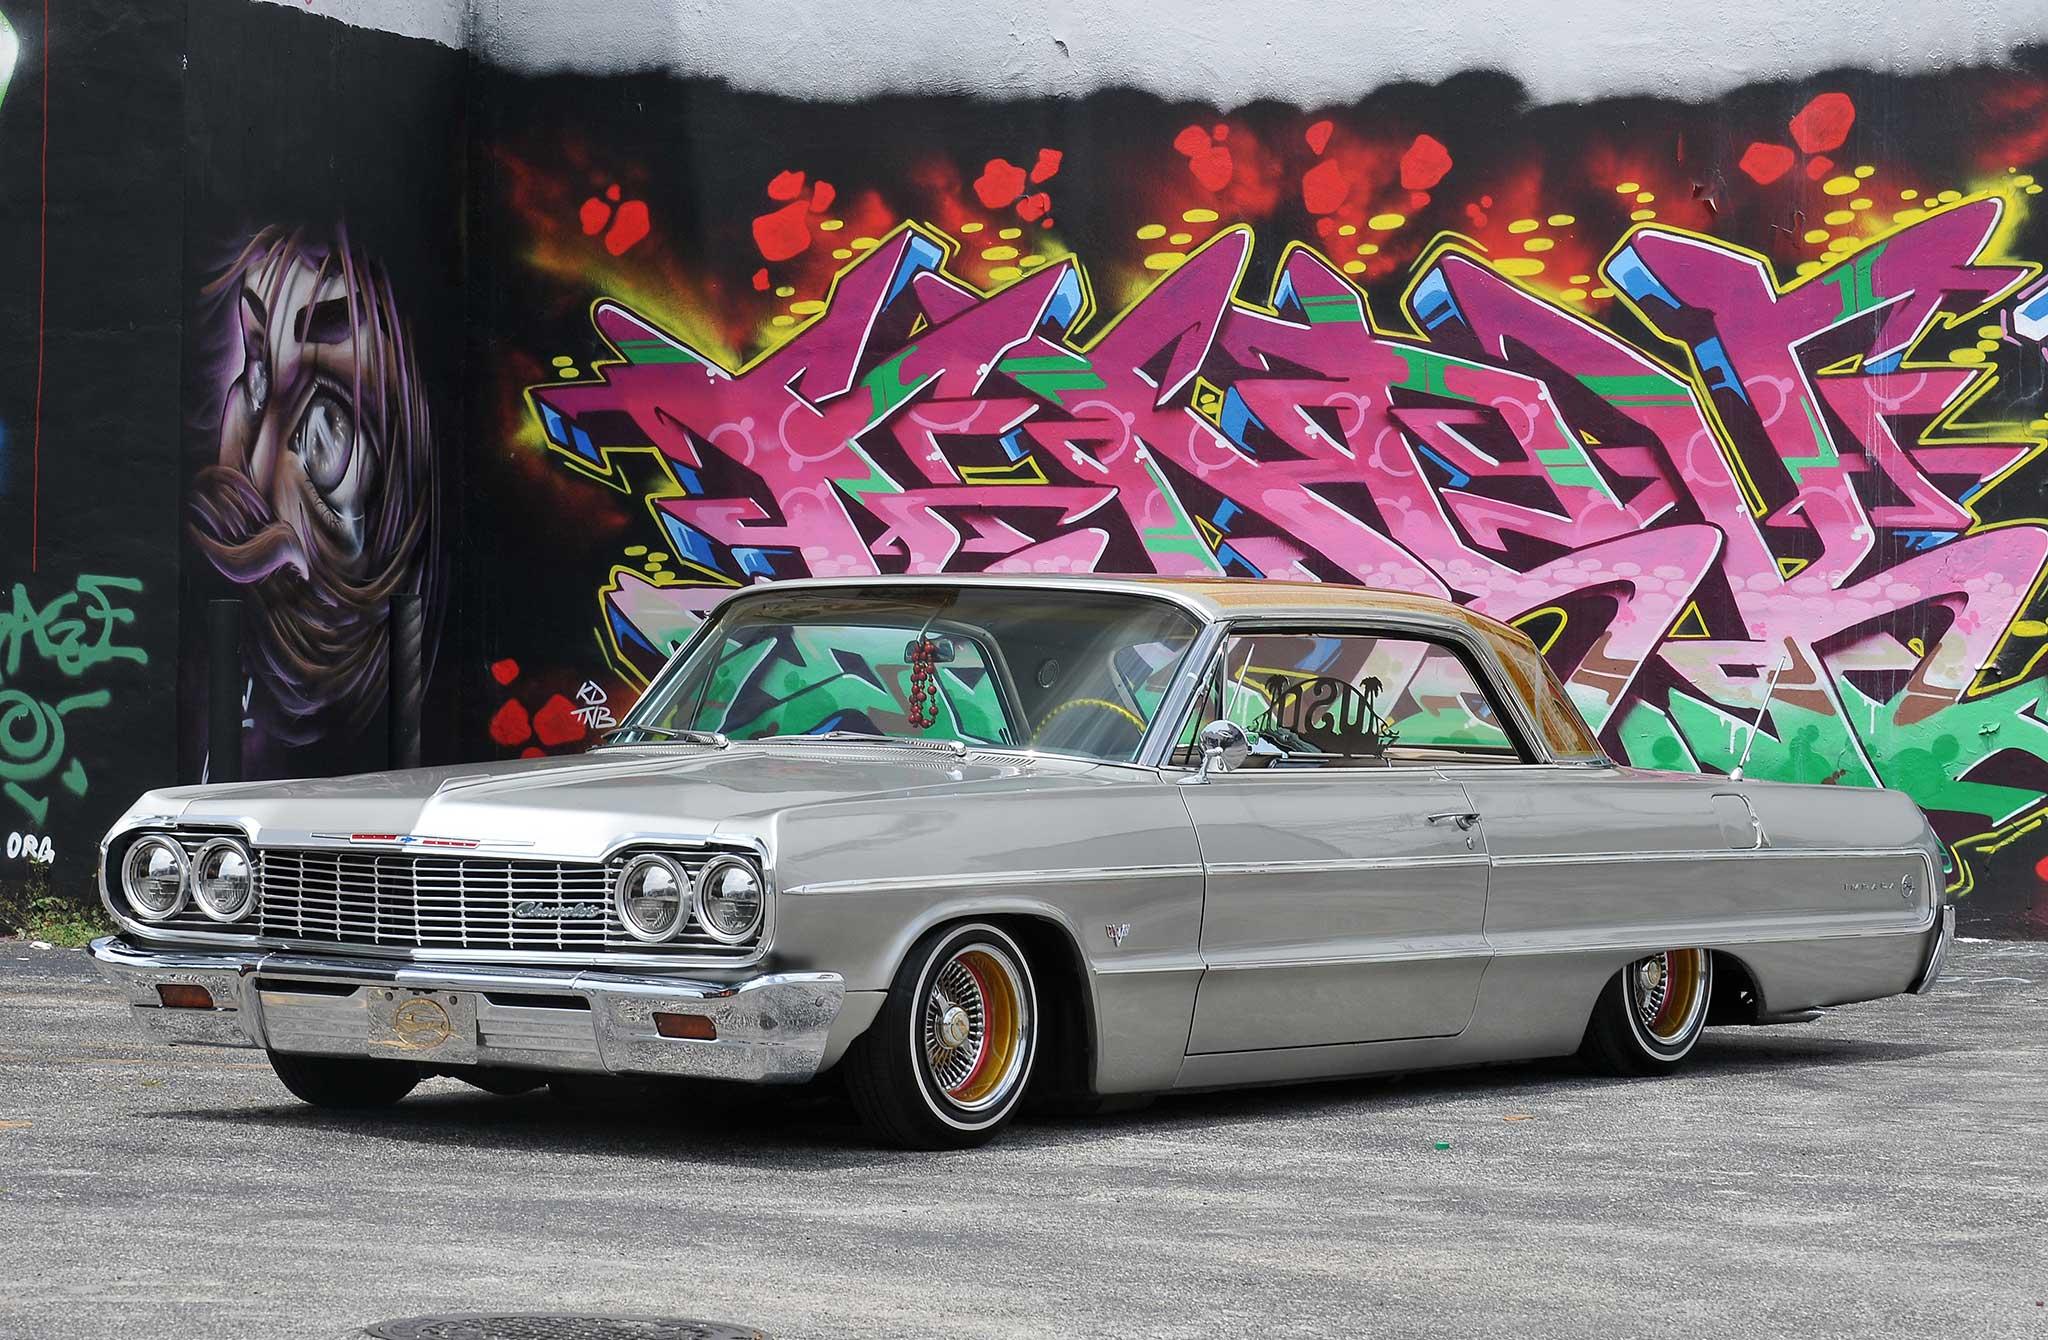 64 Impala On Dayton Wire Wheels - Wiring DATA •